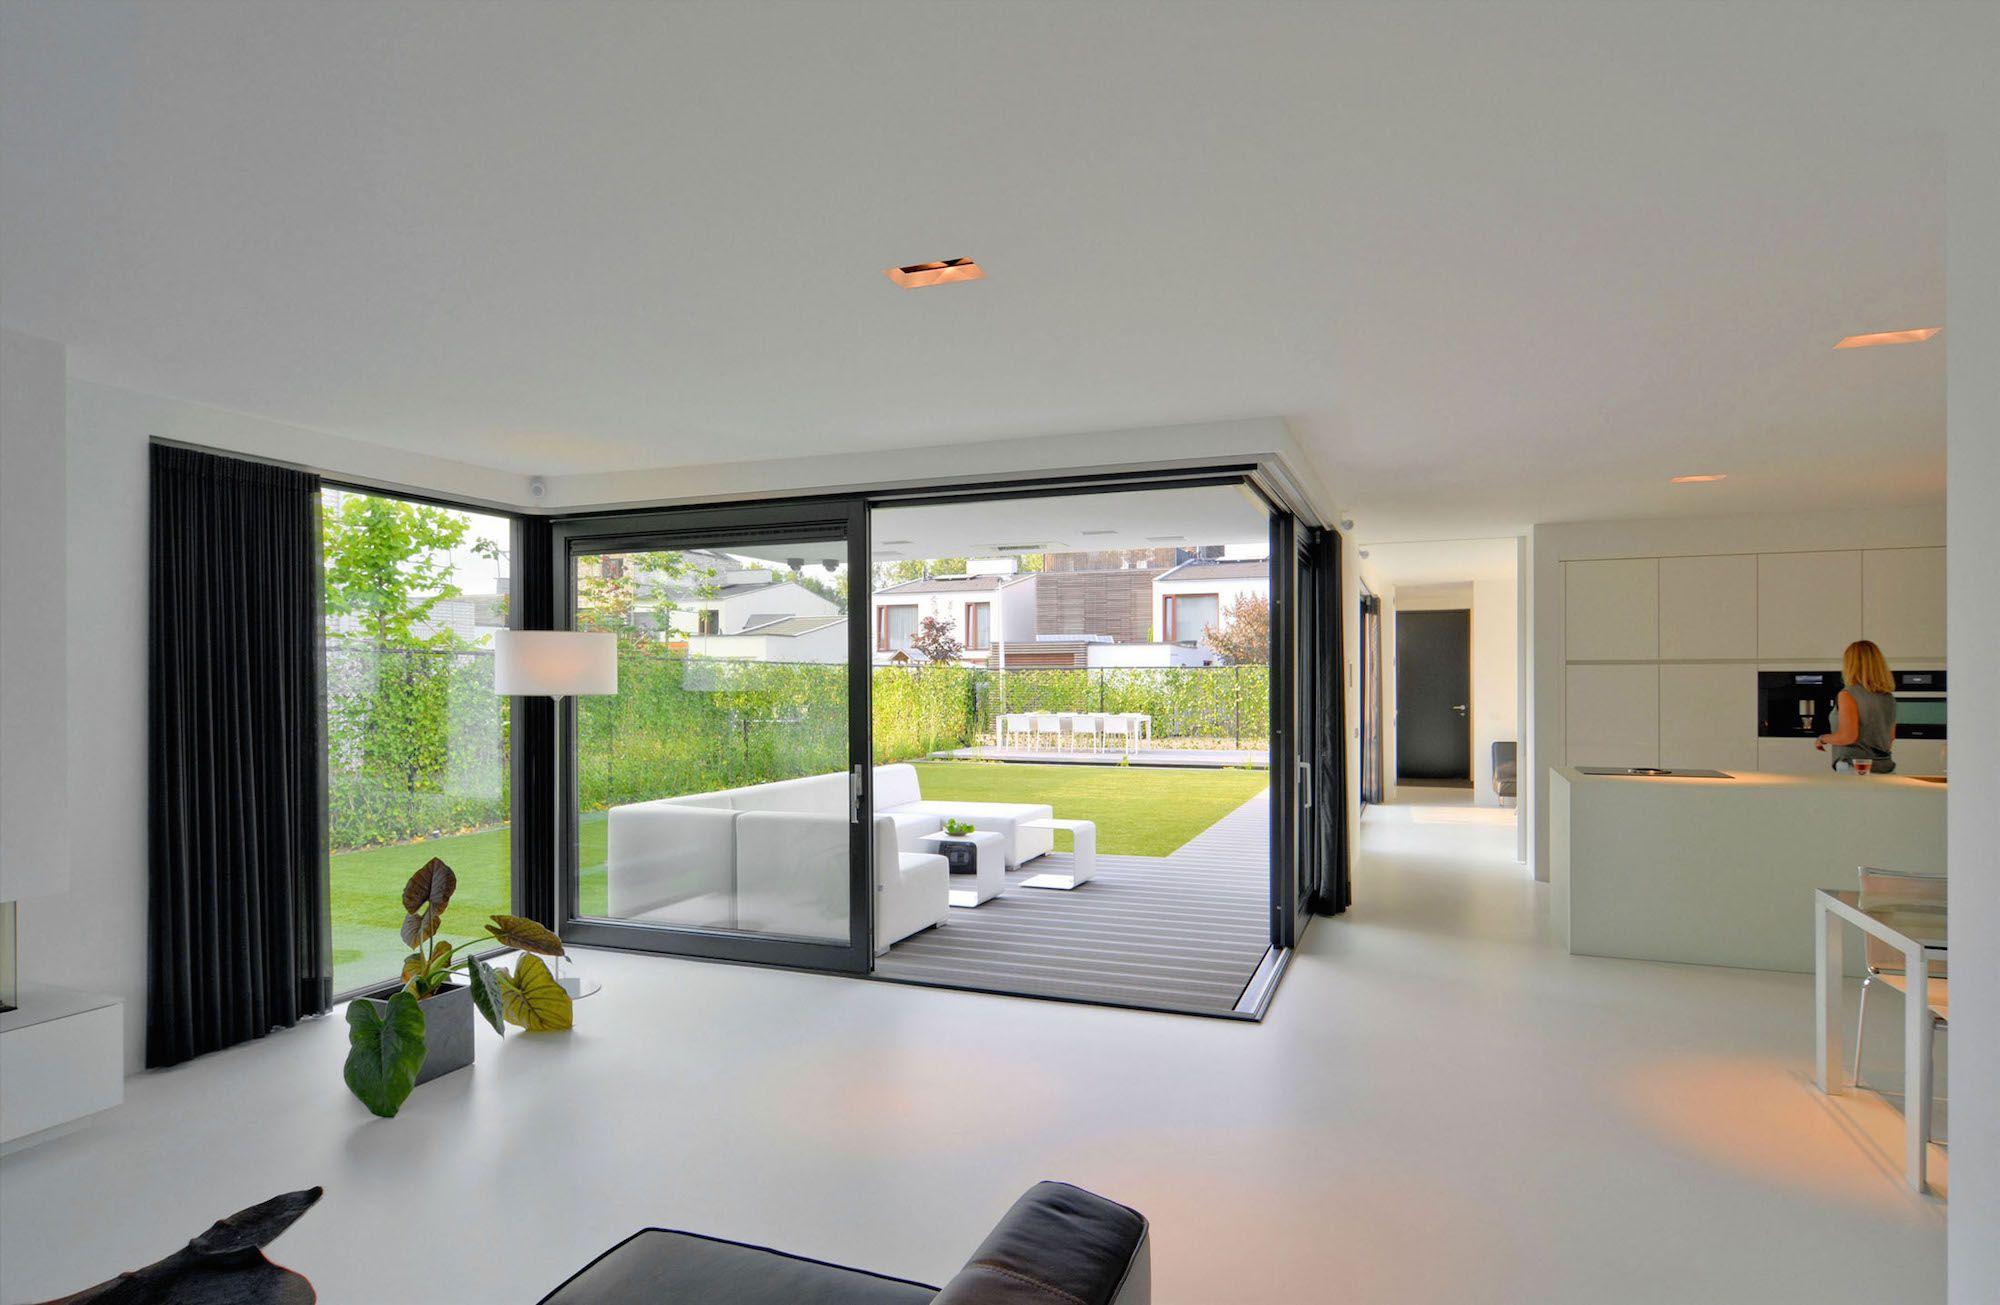 House k n by ckx architecten caandesign architecture for Interieur architecten